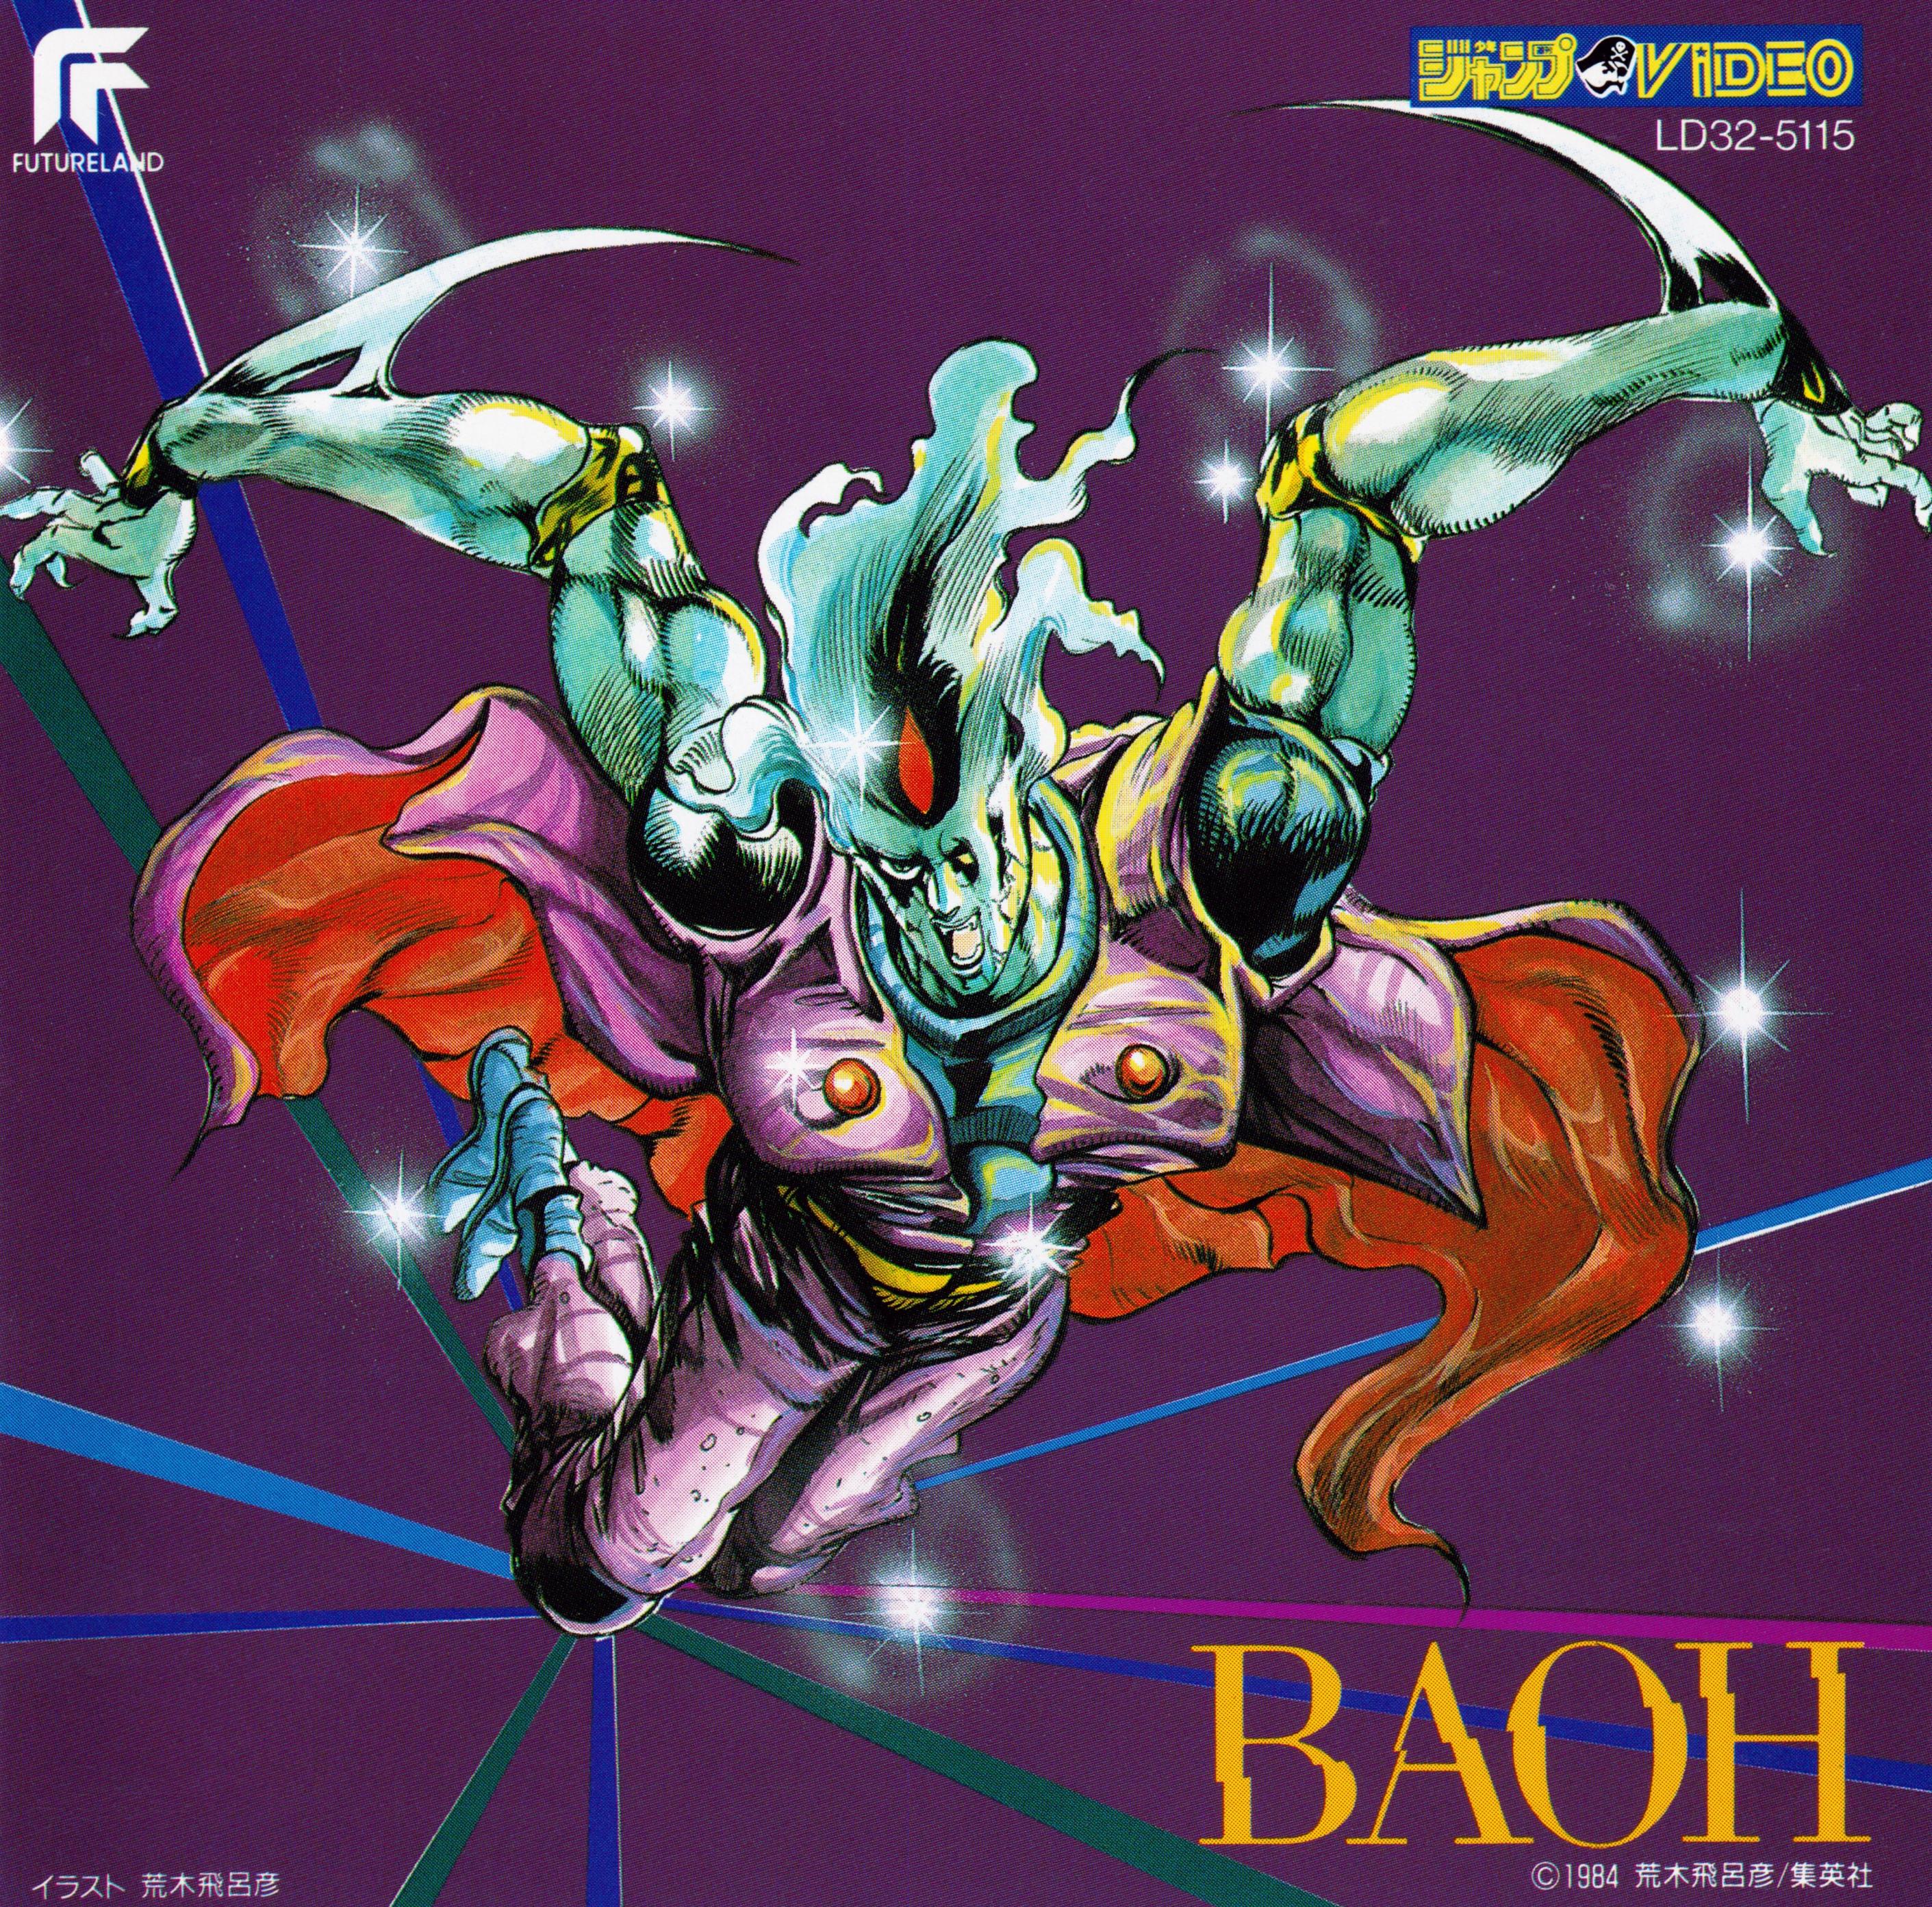 Baoh the Visitor Original Soundtrack